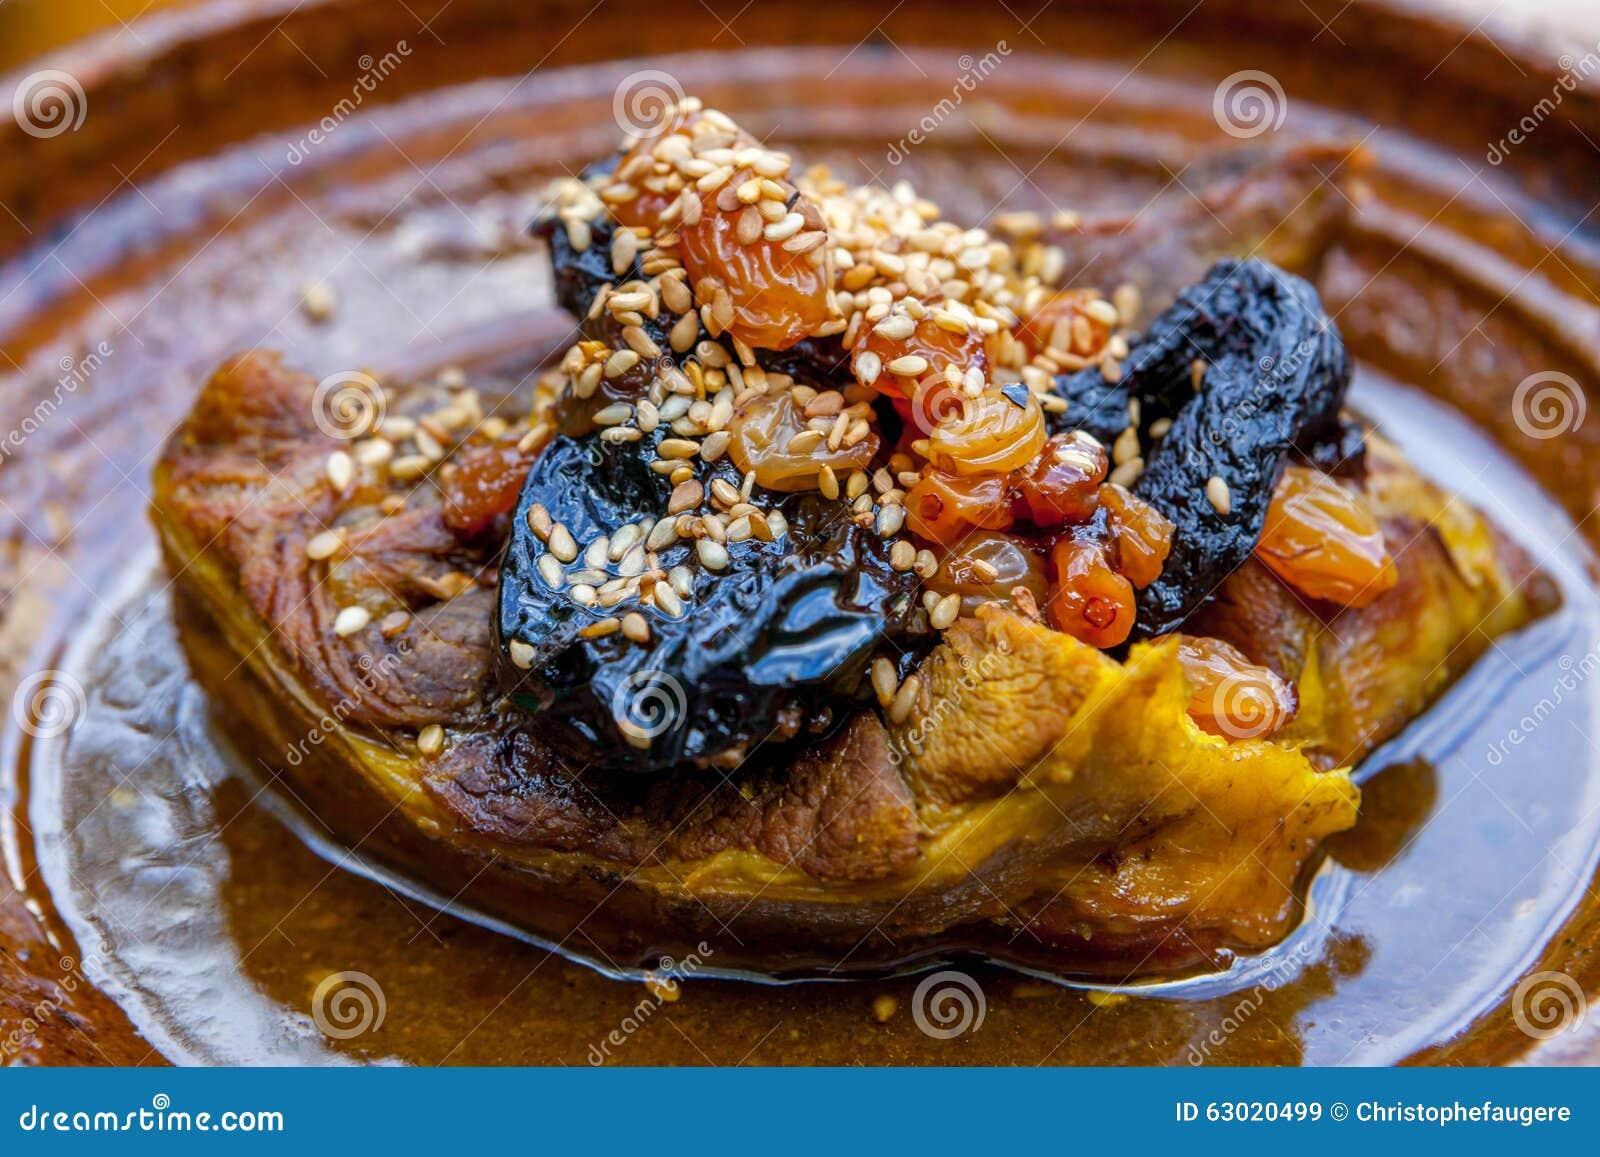 Plat typique de marocain de tajine image stock image 63020499 - Plat a tajine pour induction ...